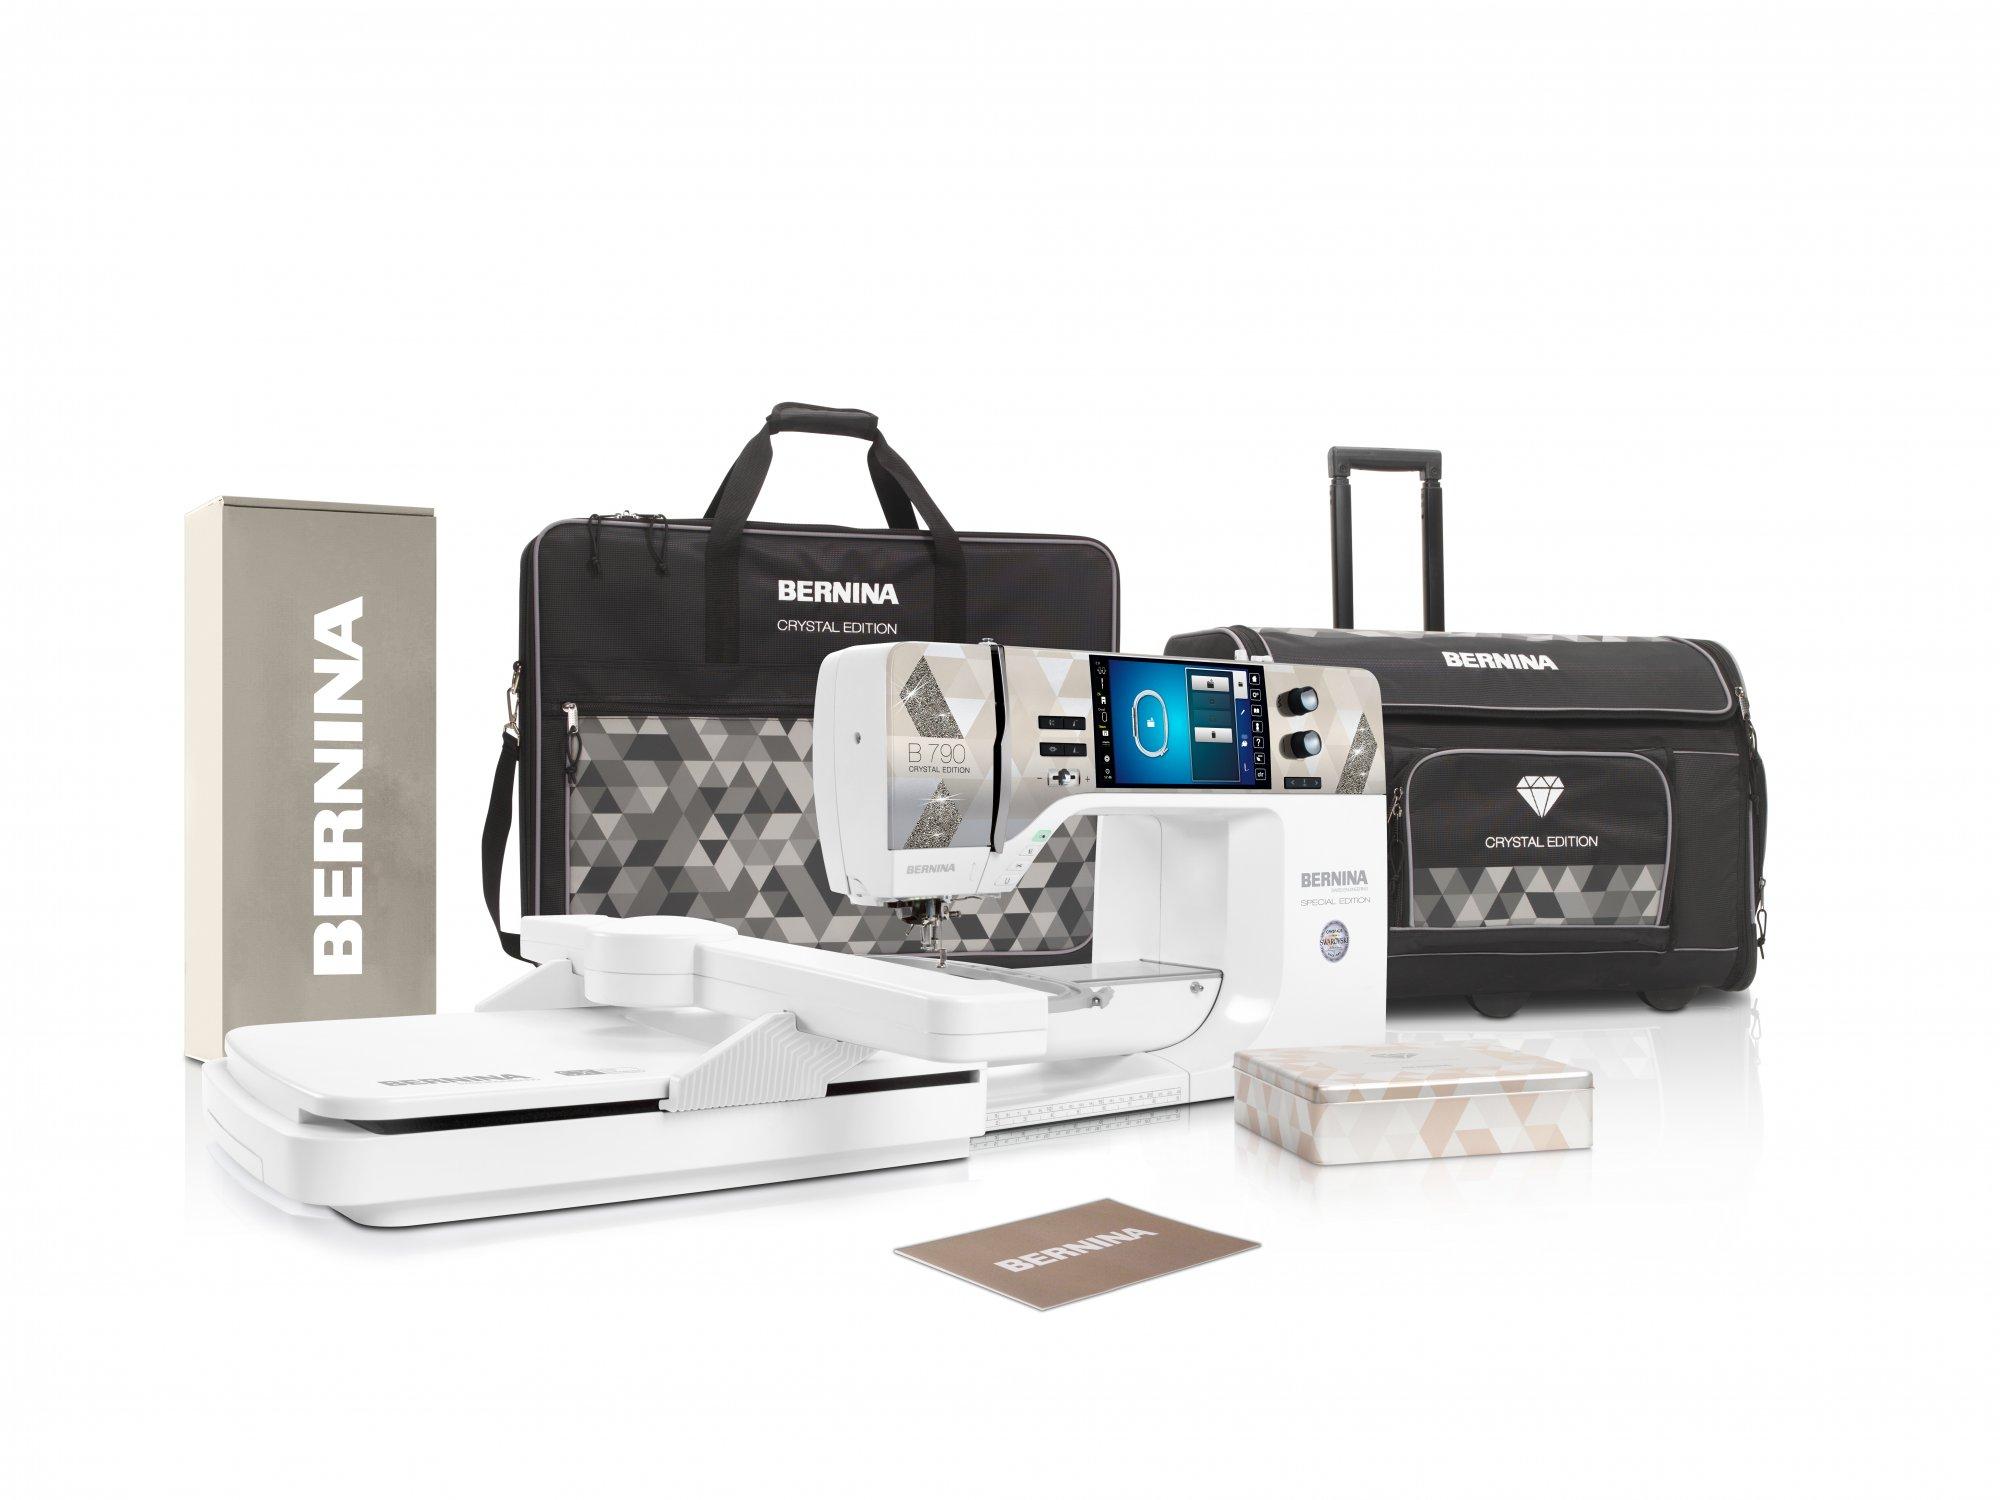 Bernina 790 Crystal Edition